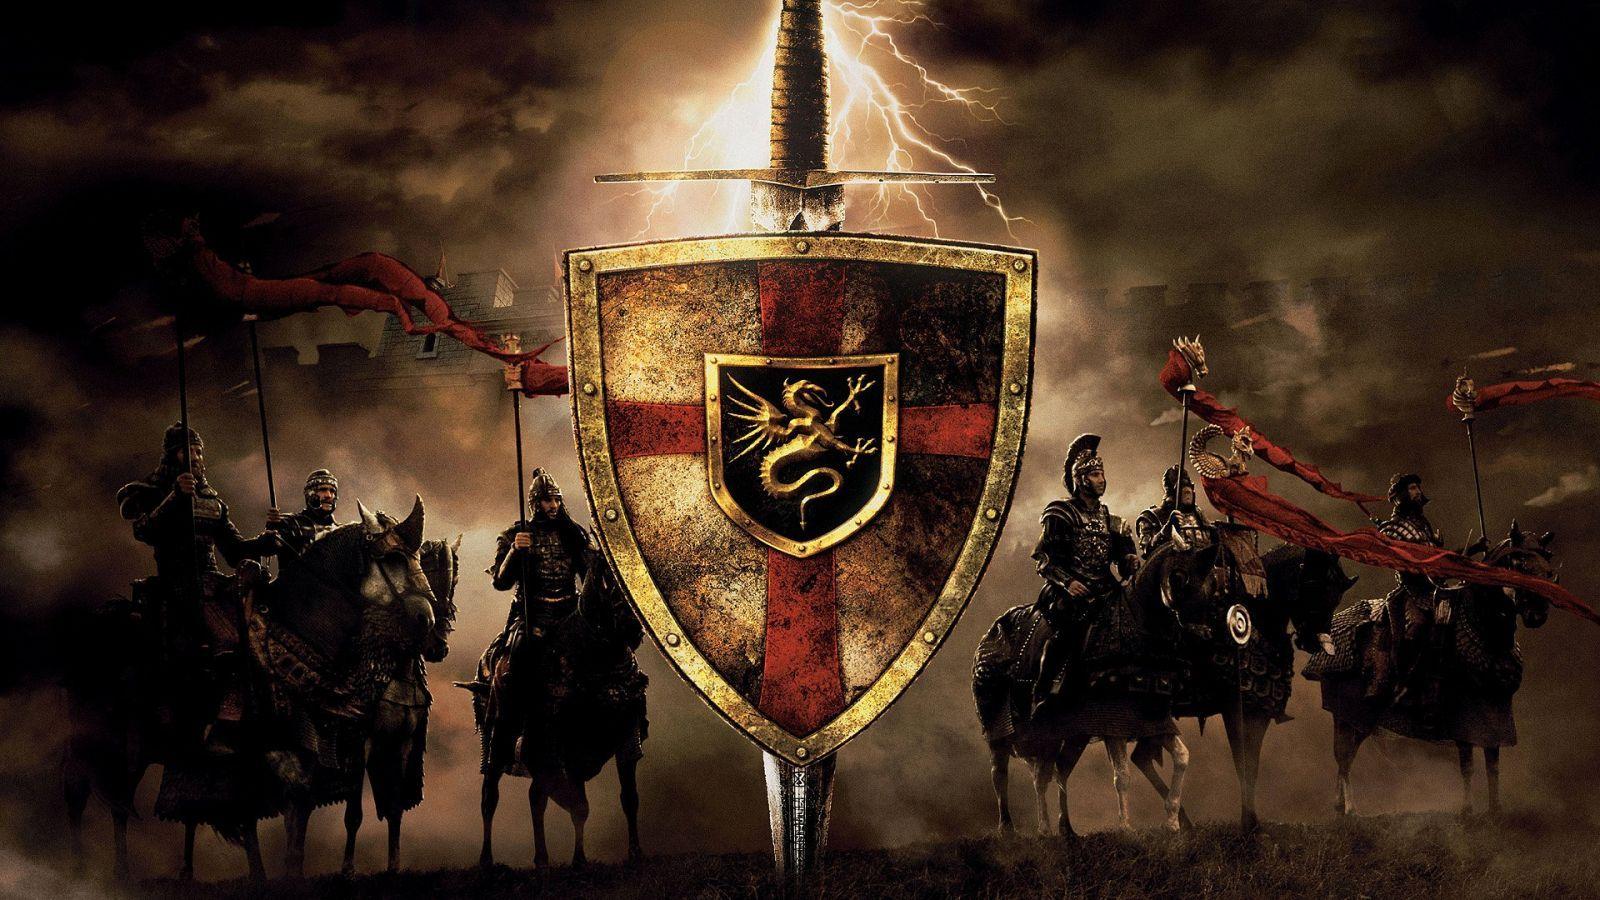 Kral Arthur (King Arthur 2004)